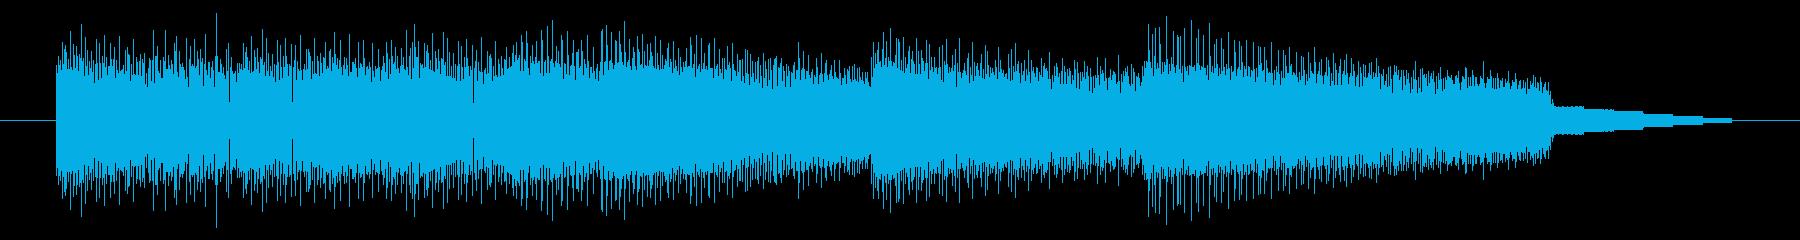 GB風RPGのジングルの再生済みの波形